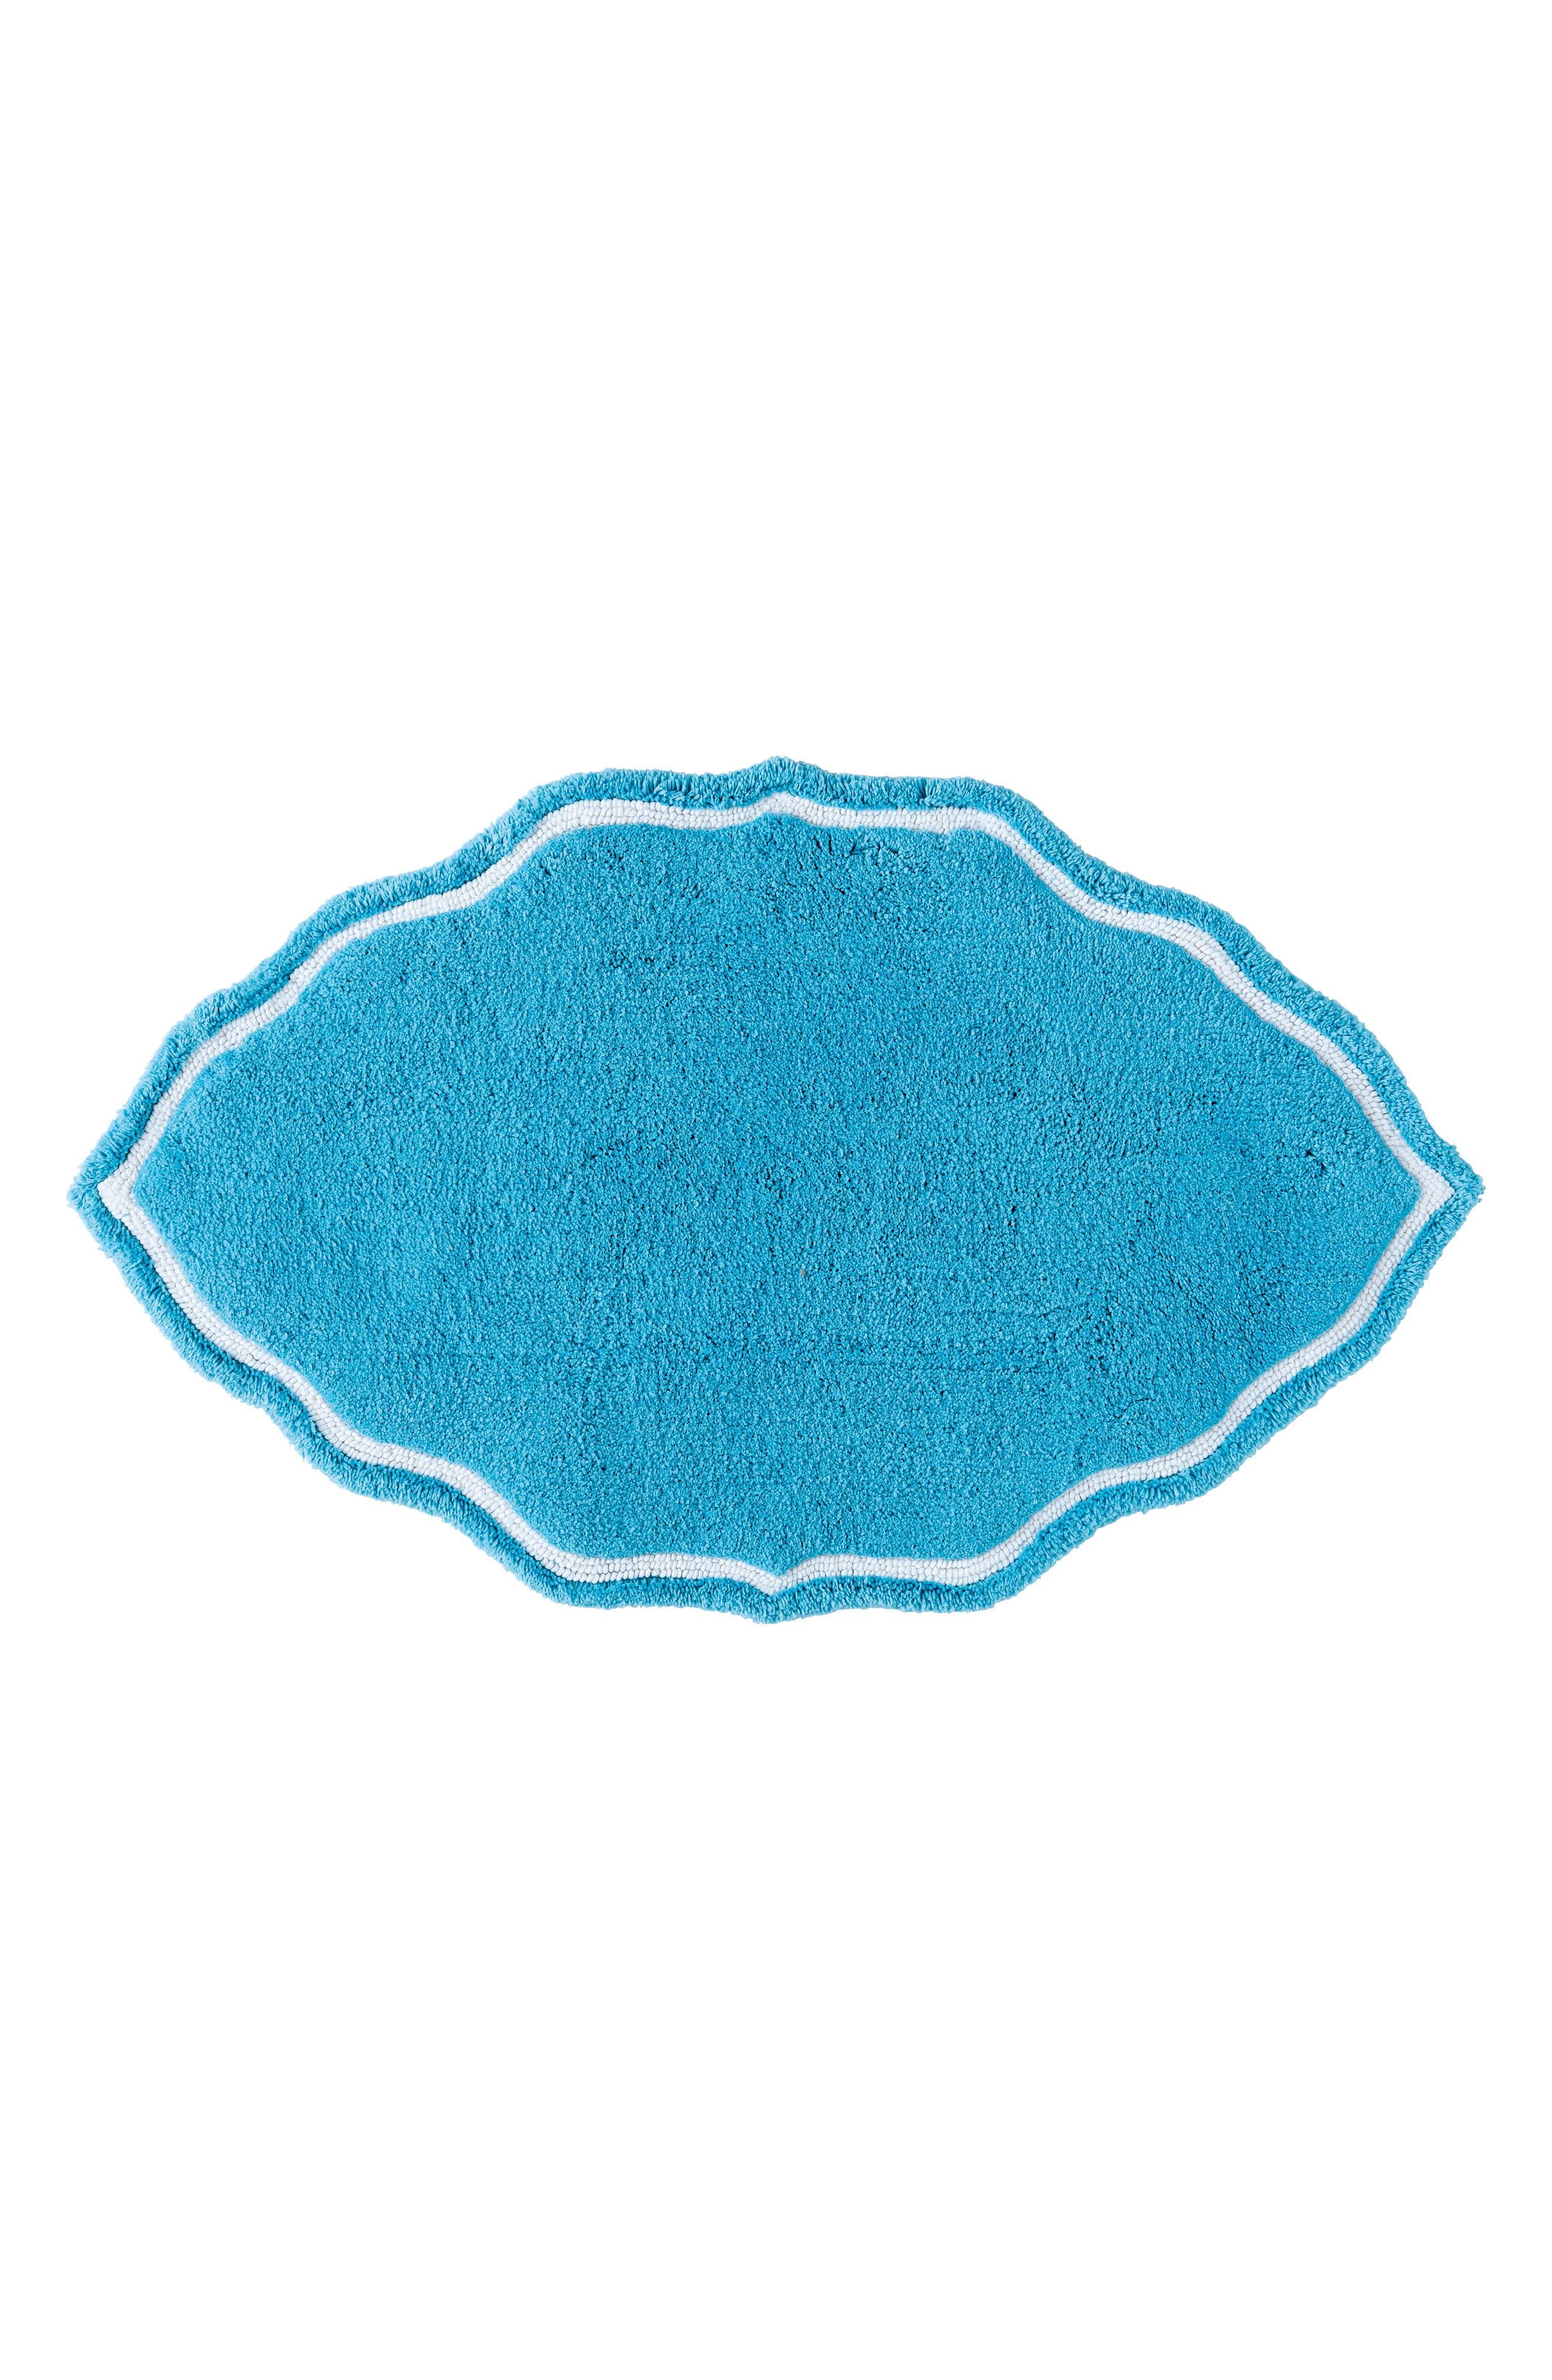 Signature Hand Tufted Bath Rug,                             Main thumbnail 1, color,                             500